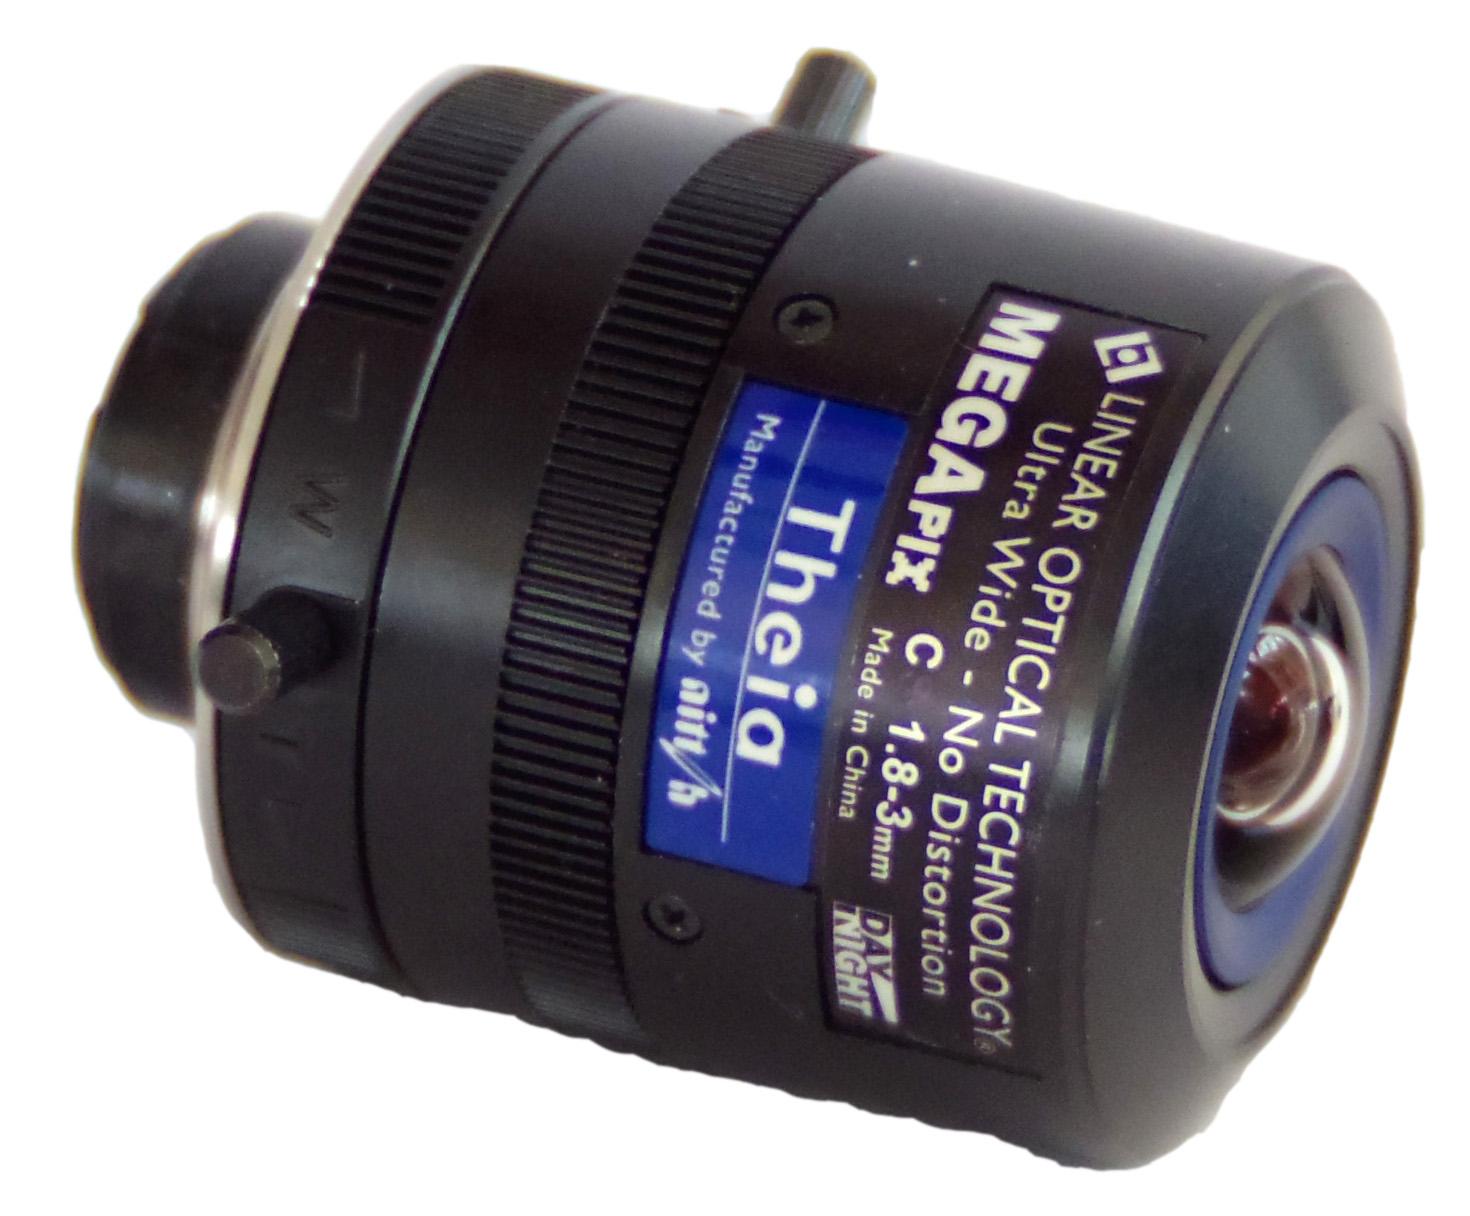 Theia ML183A lens